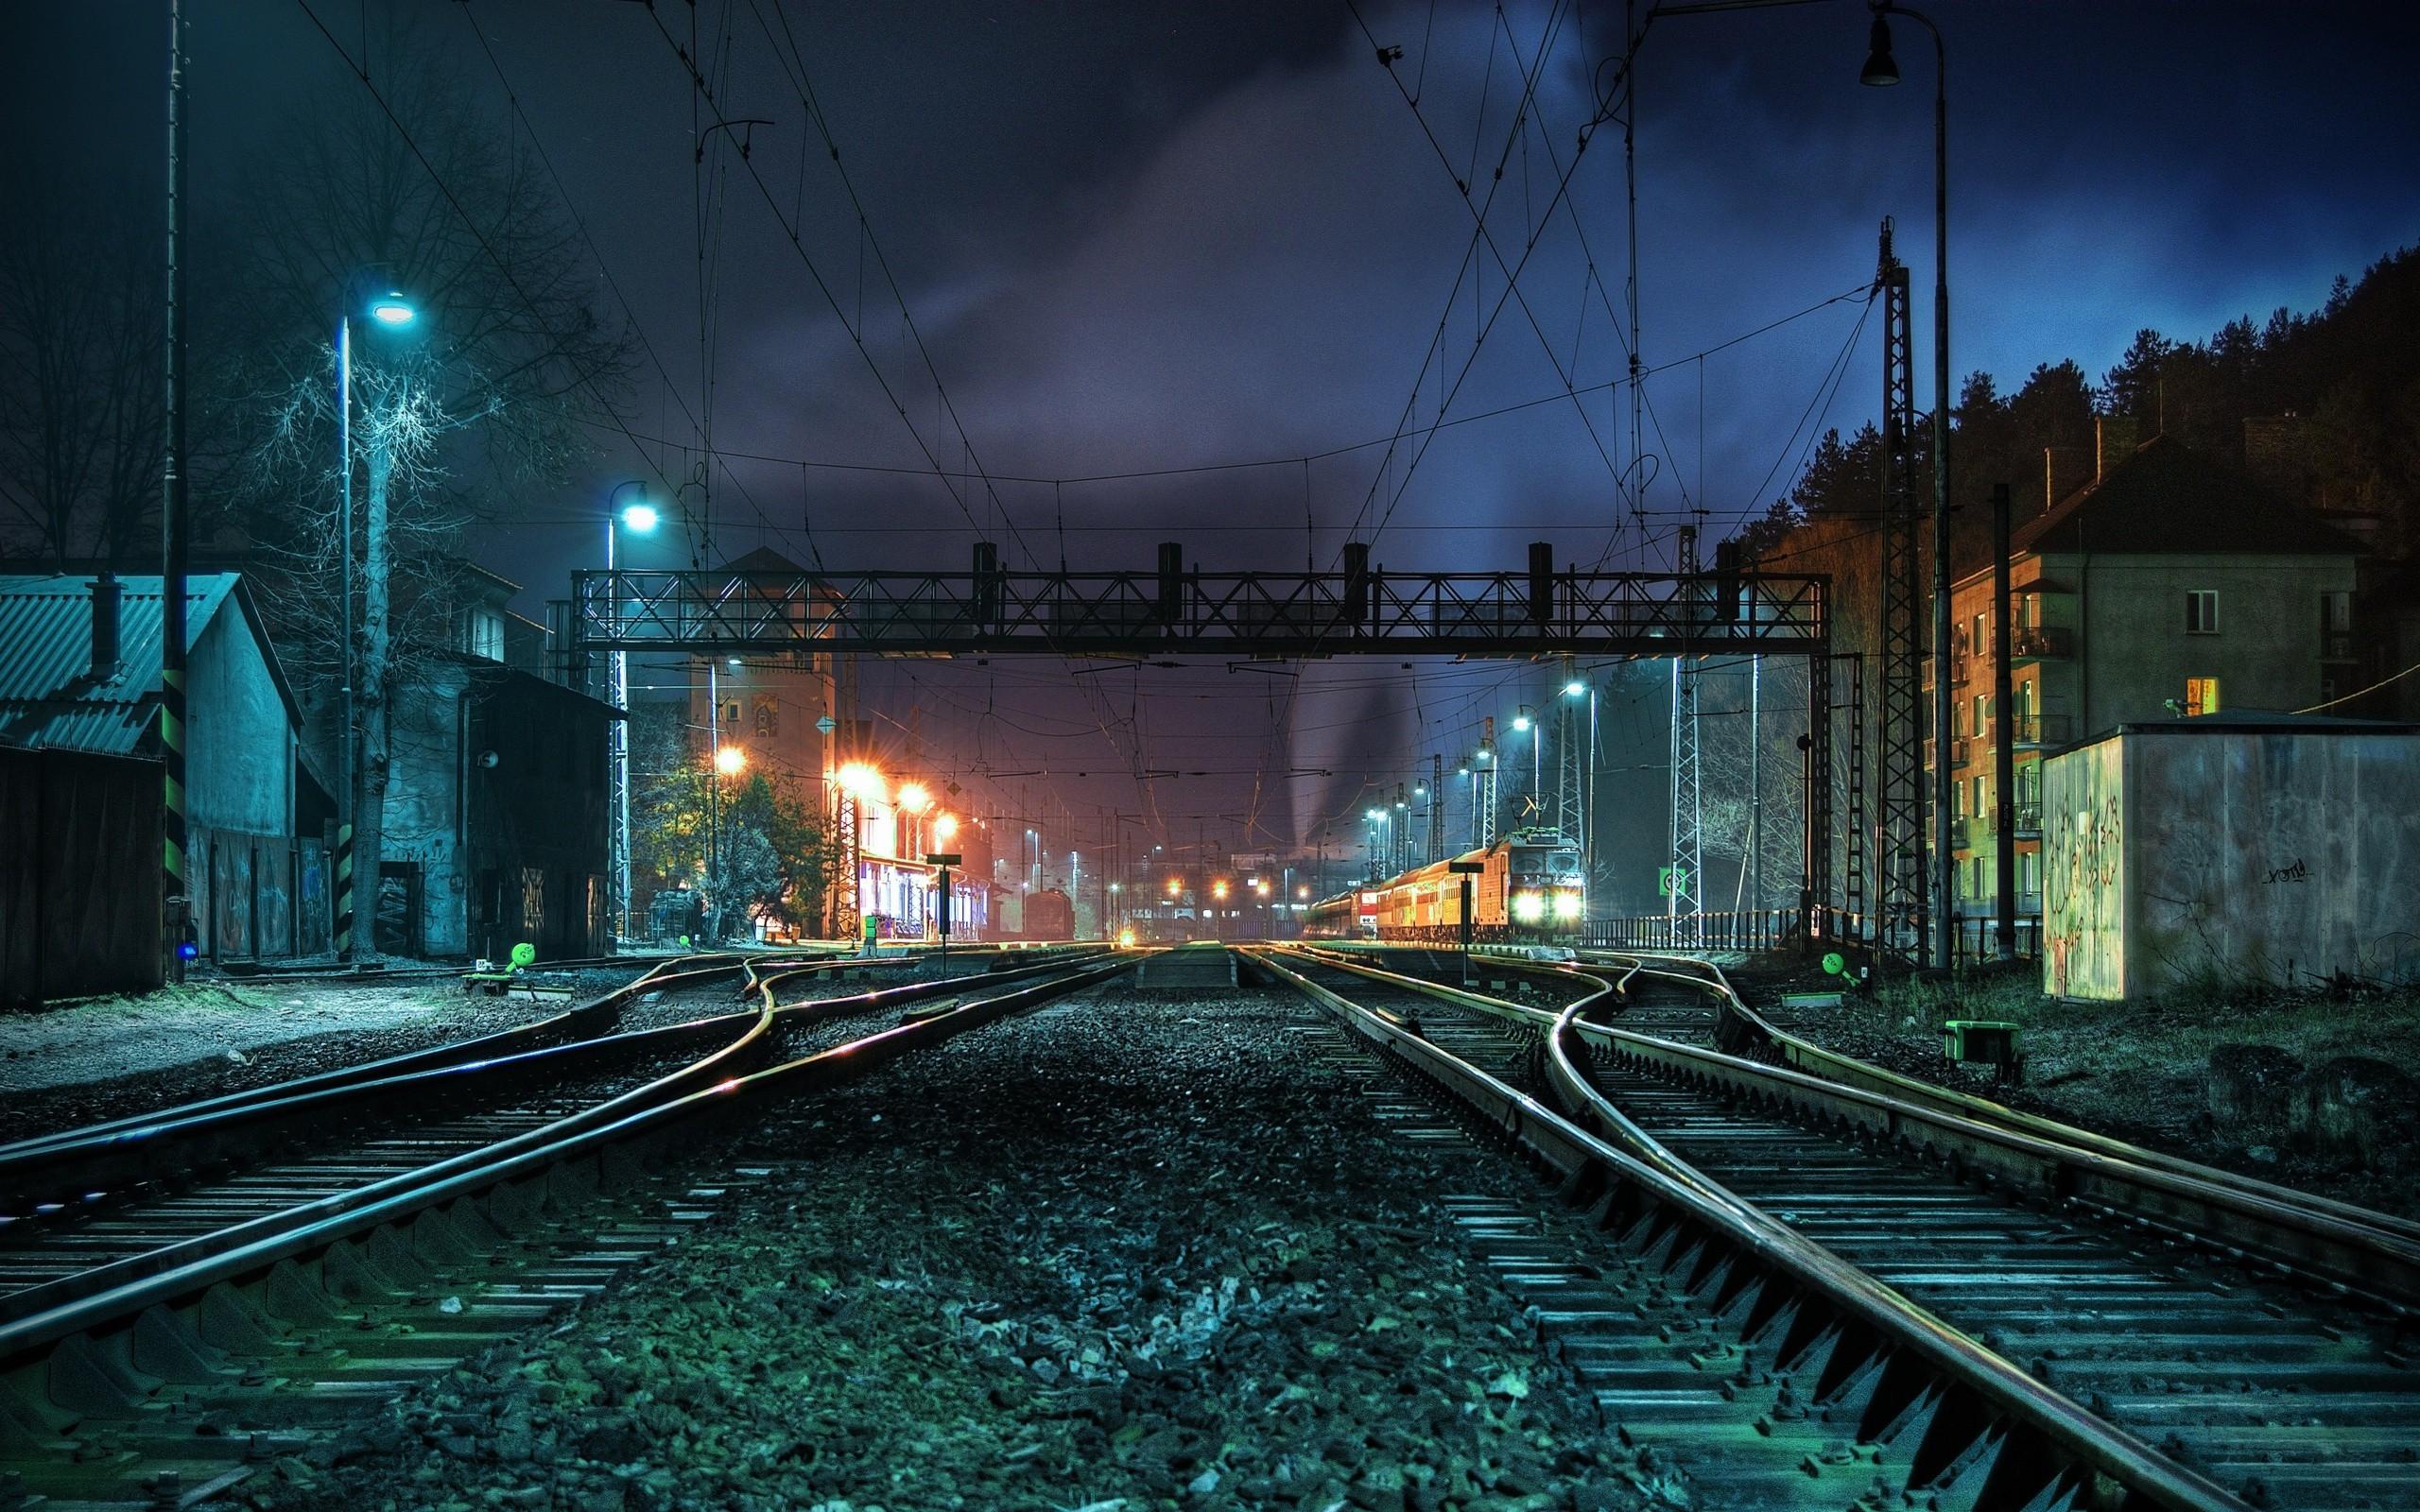 Lights Trains Railroad Tracks HD Background Wallpaper   HD Wallpapers 2560x1600